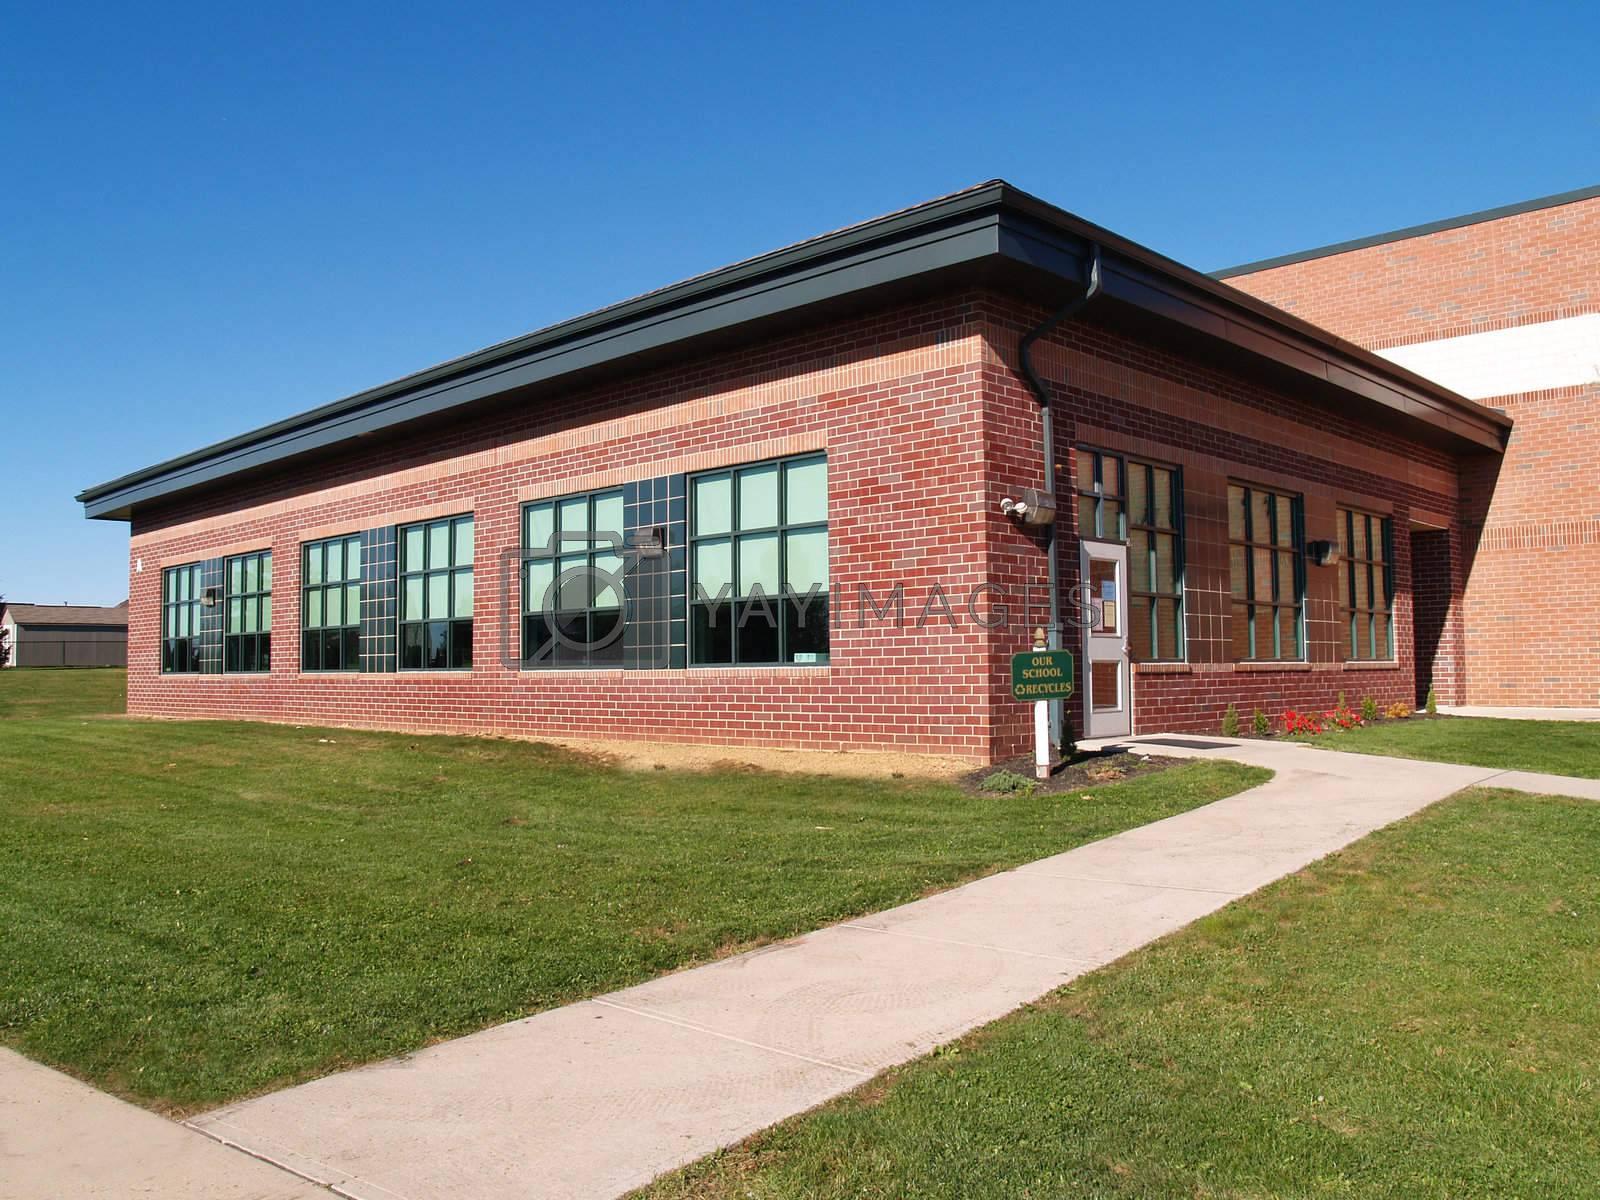 red brick elementary school in New Jersey